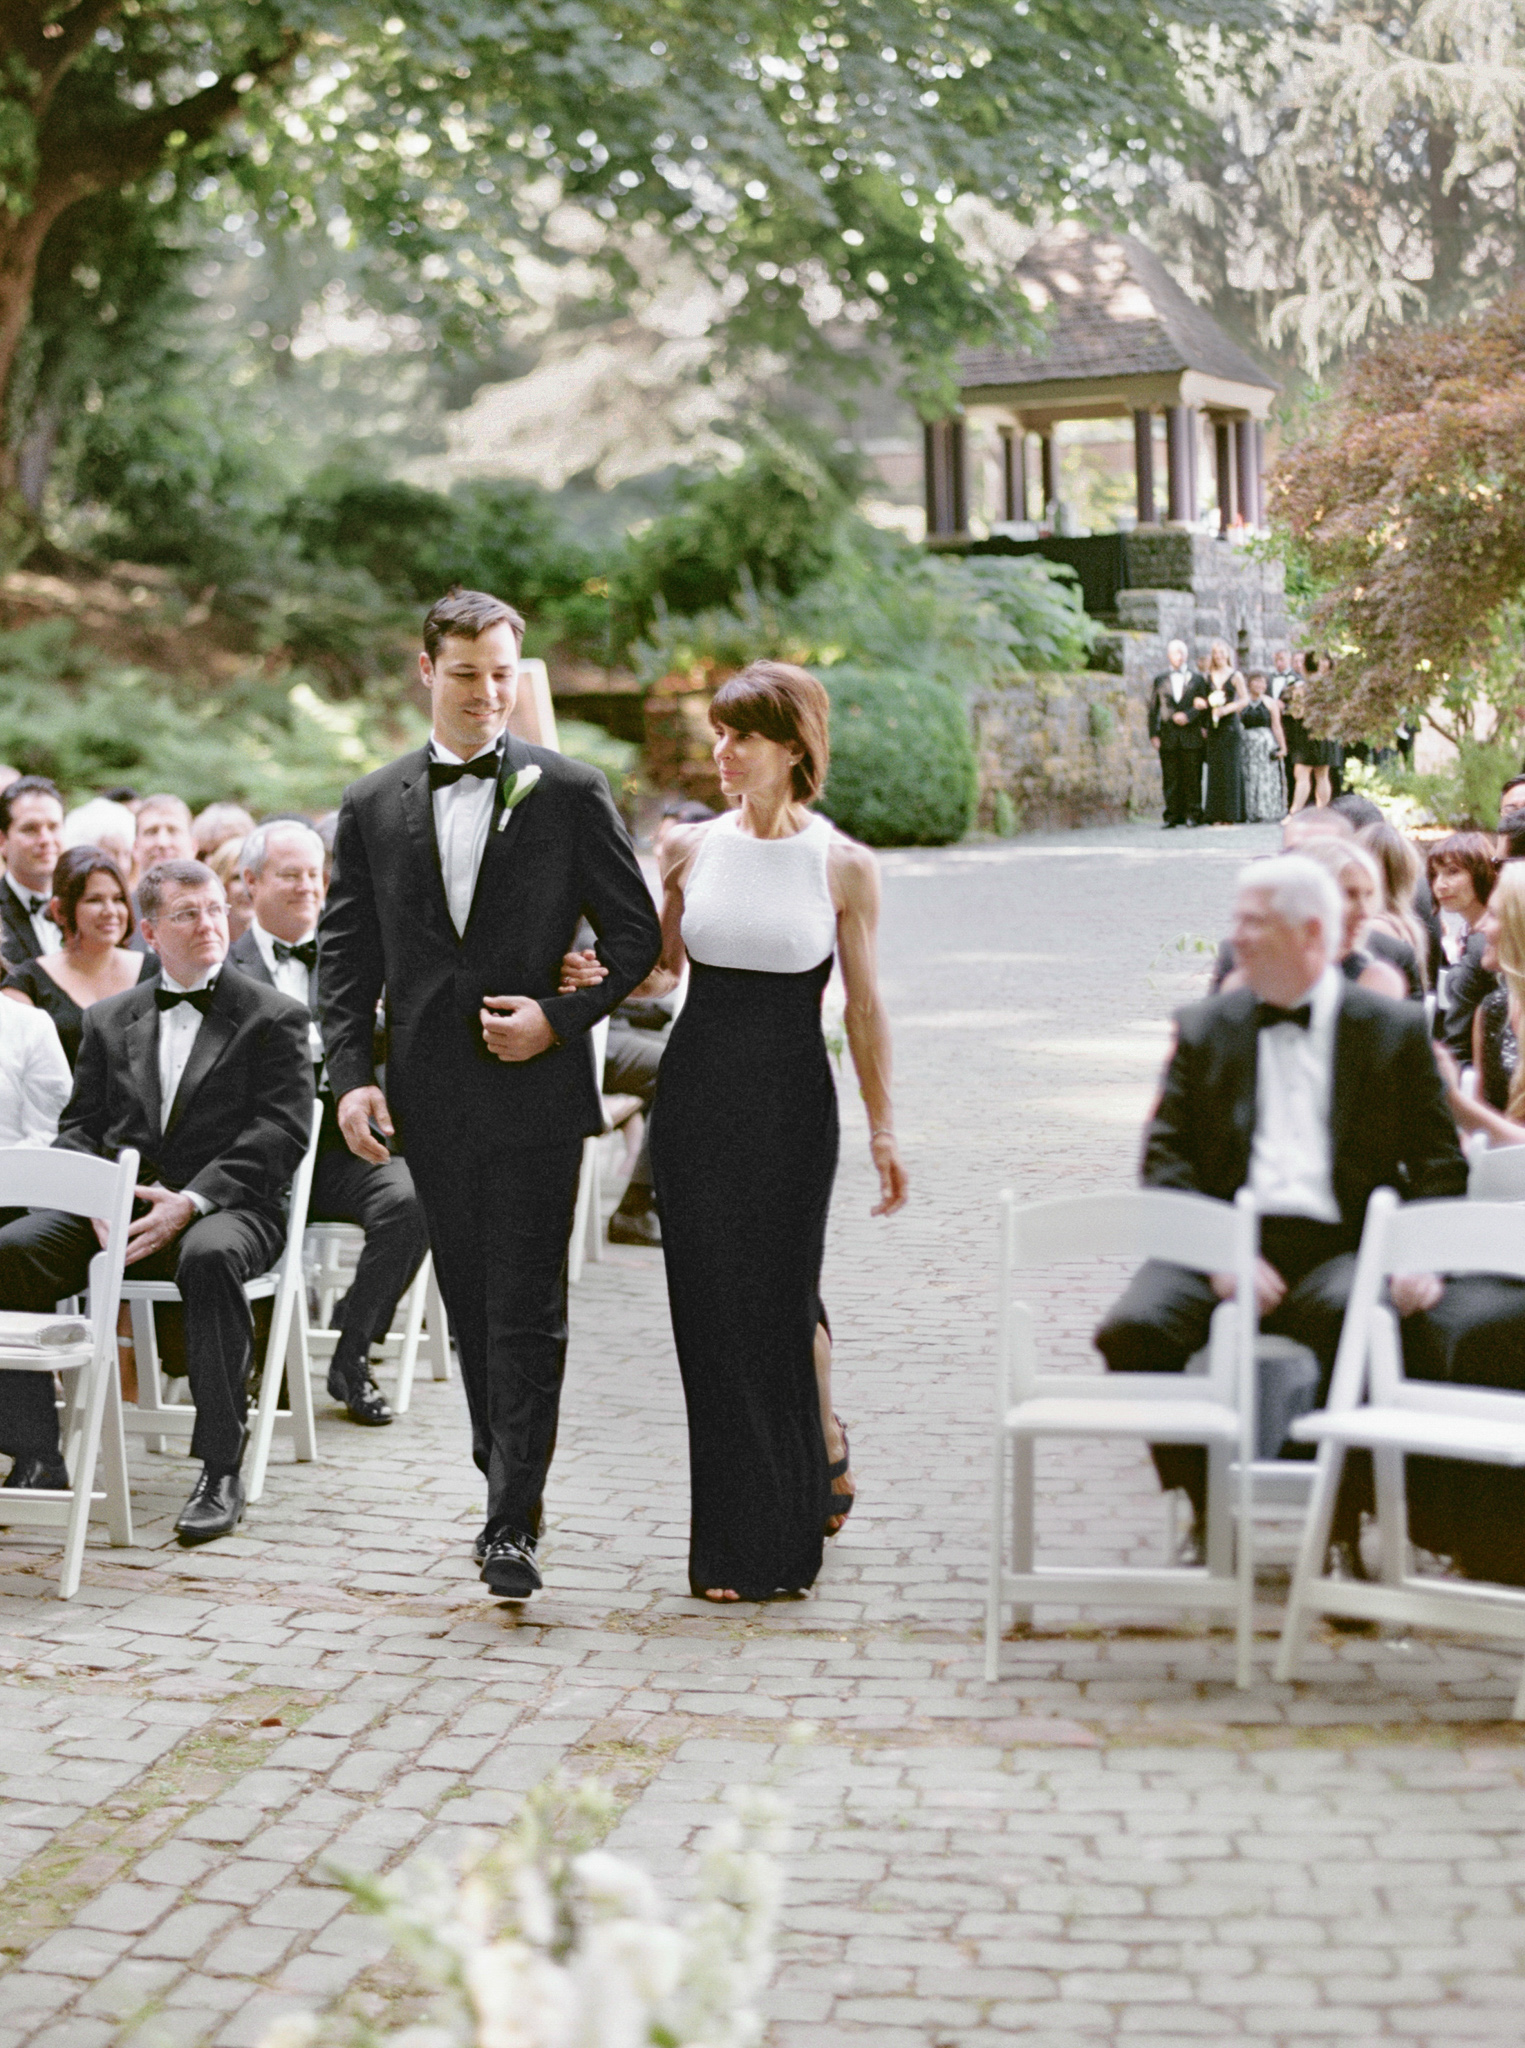 124OutliveCreative_Travel_Photographer_Videographer_Lewis&Clark_Oregon_Elegant_BlackTie_Destination_Wedding.jpg